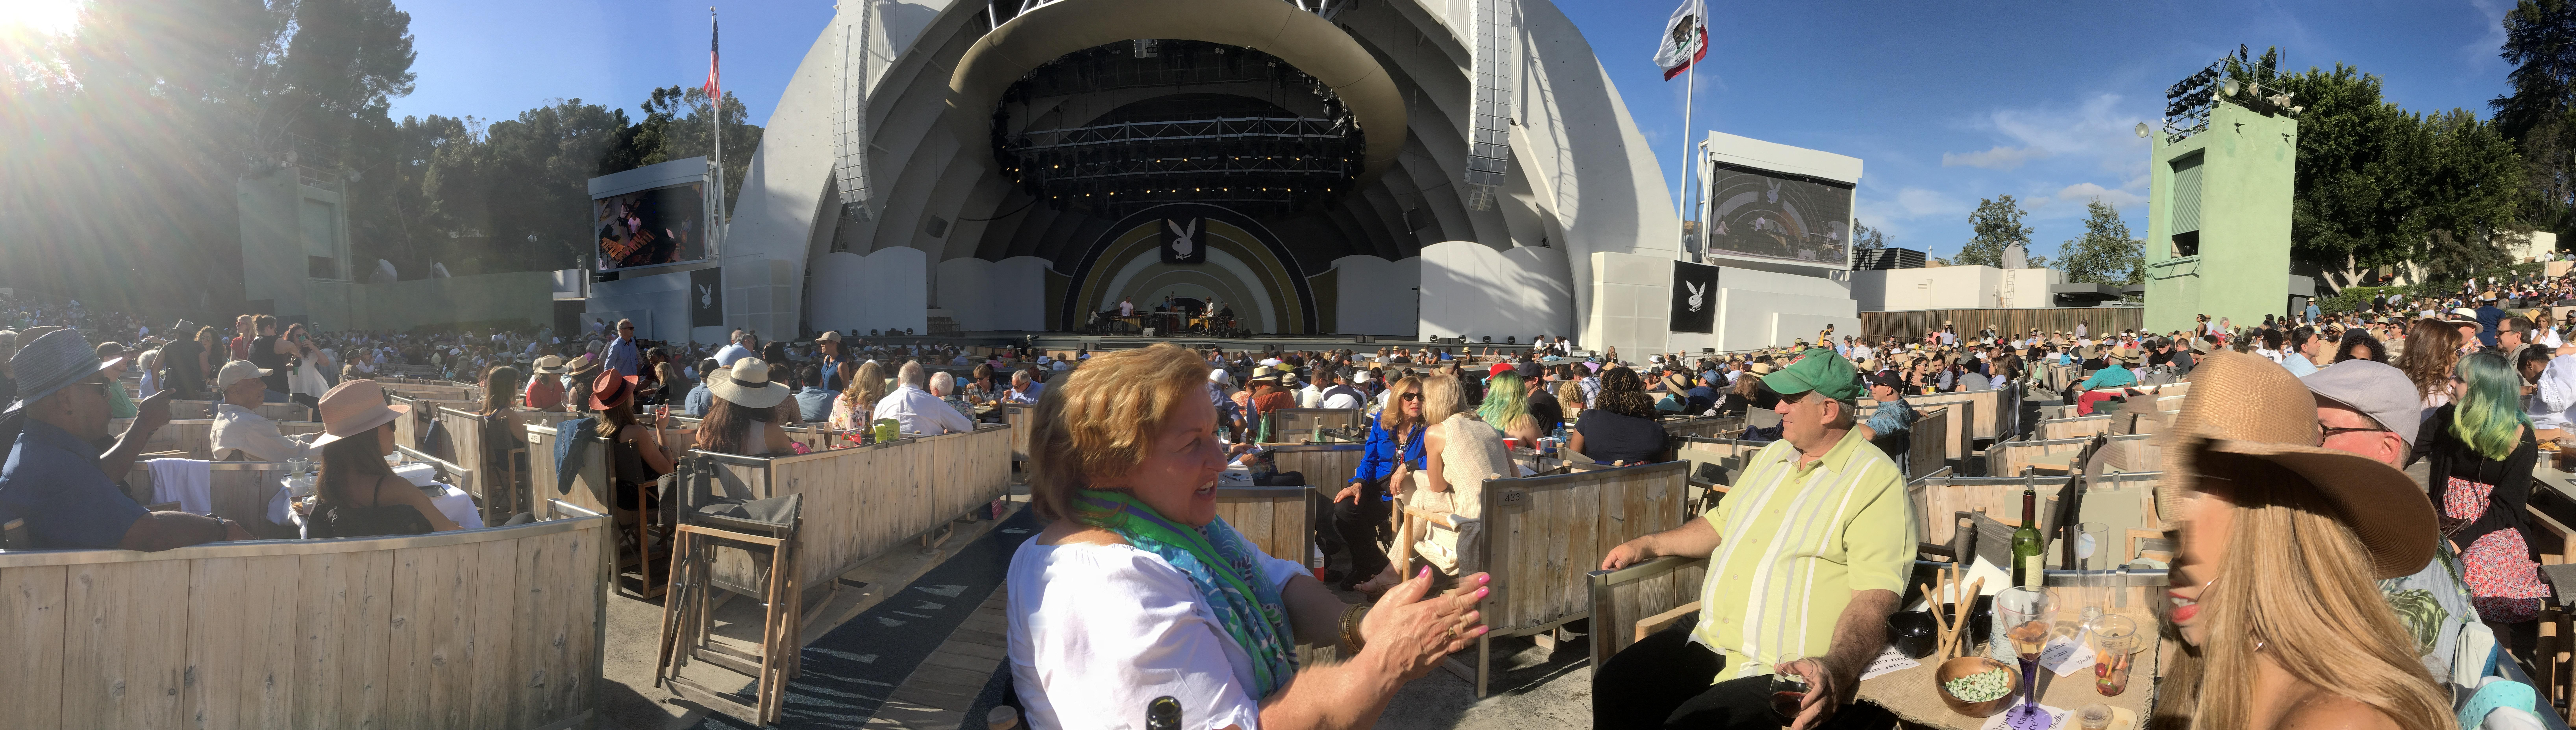 Playboy Jazz Festival 2017 at the Hollywood Bowl